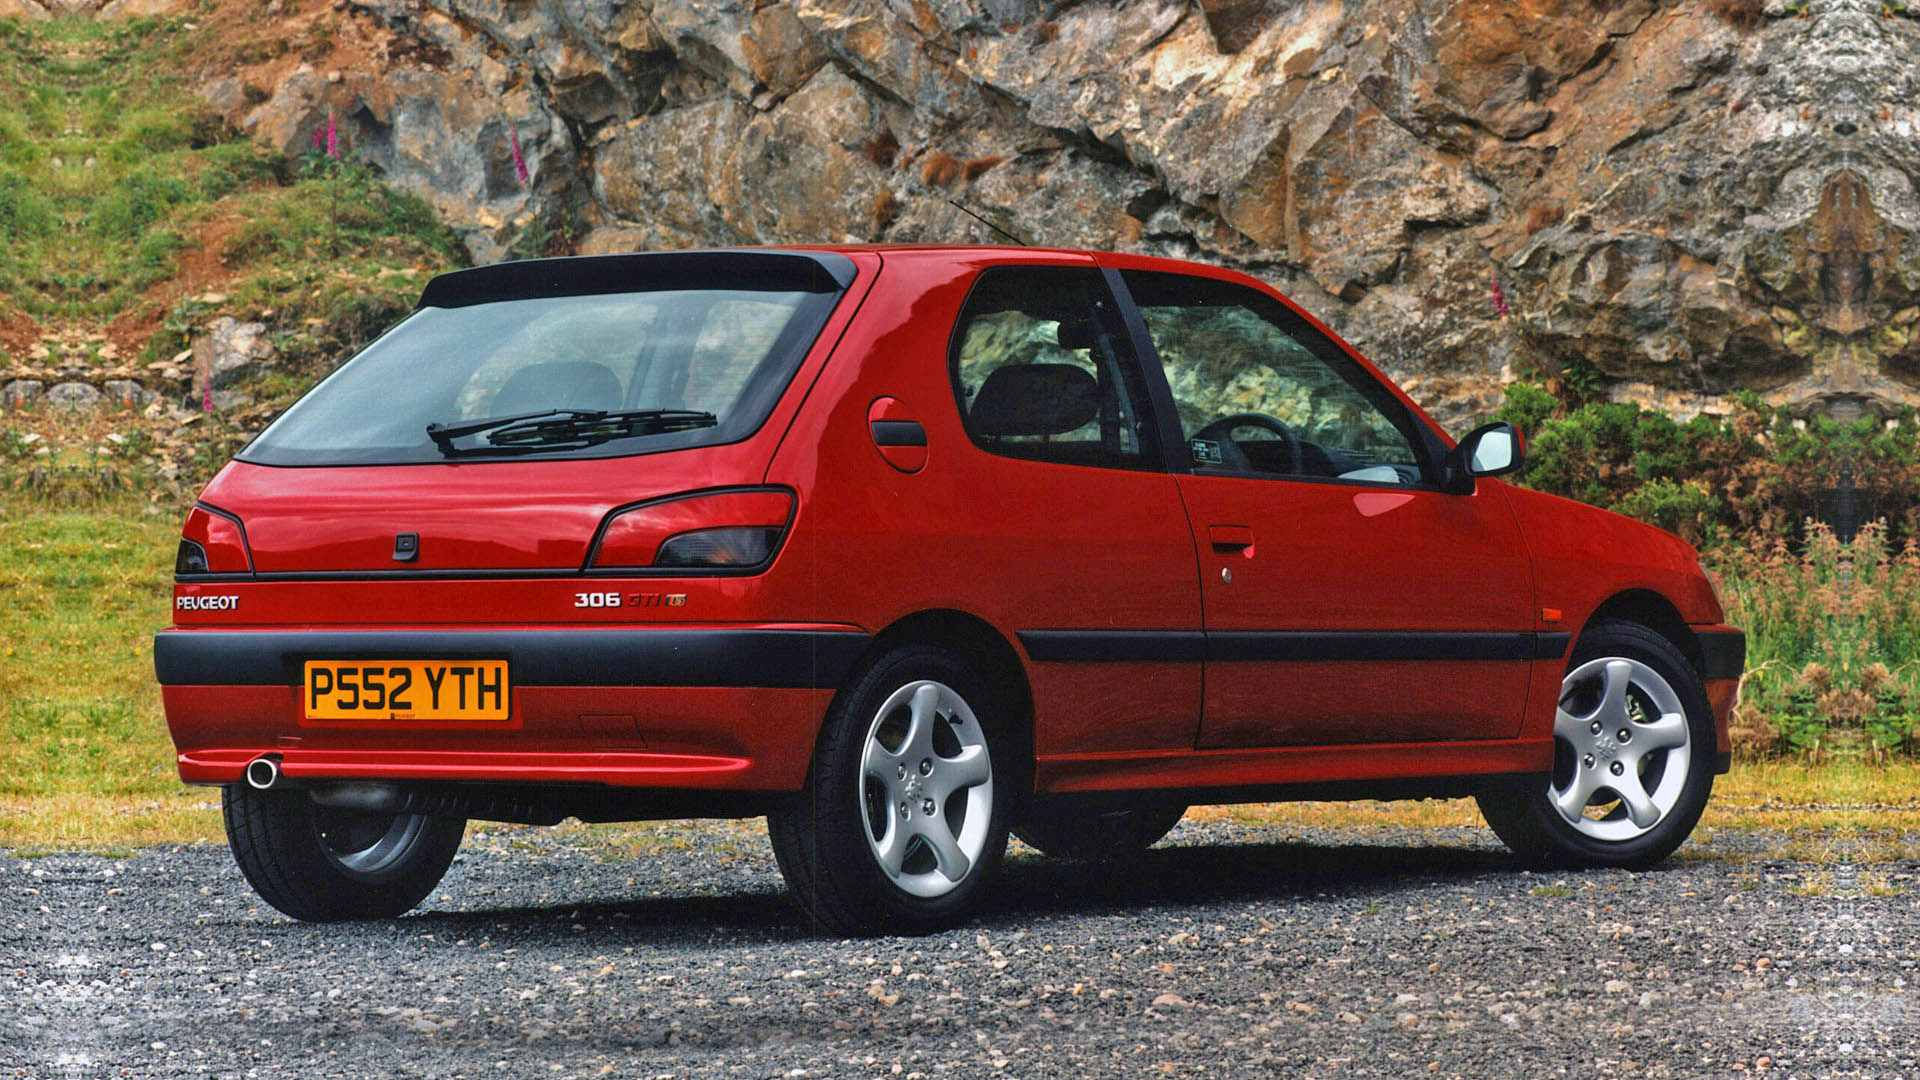 Peugeot 306 GTi 1997 2